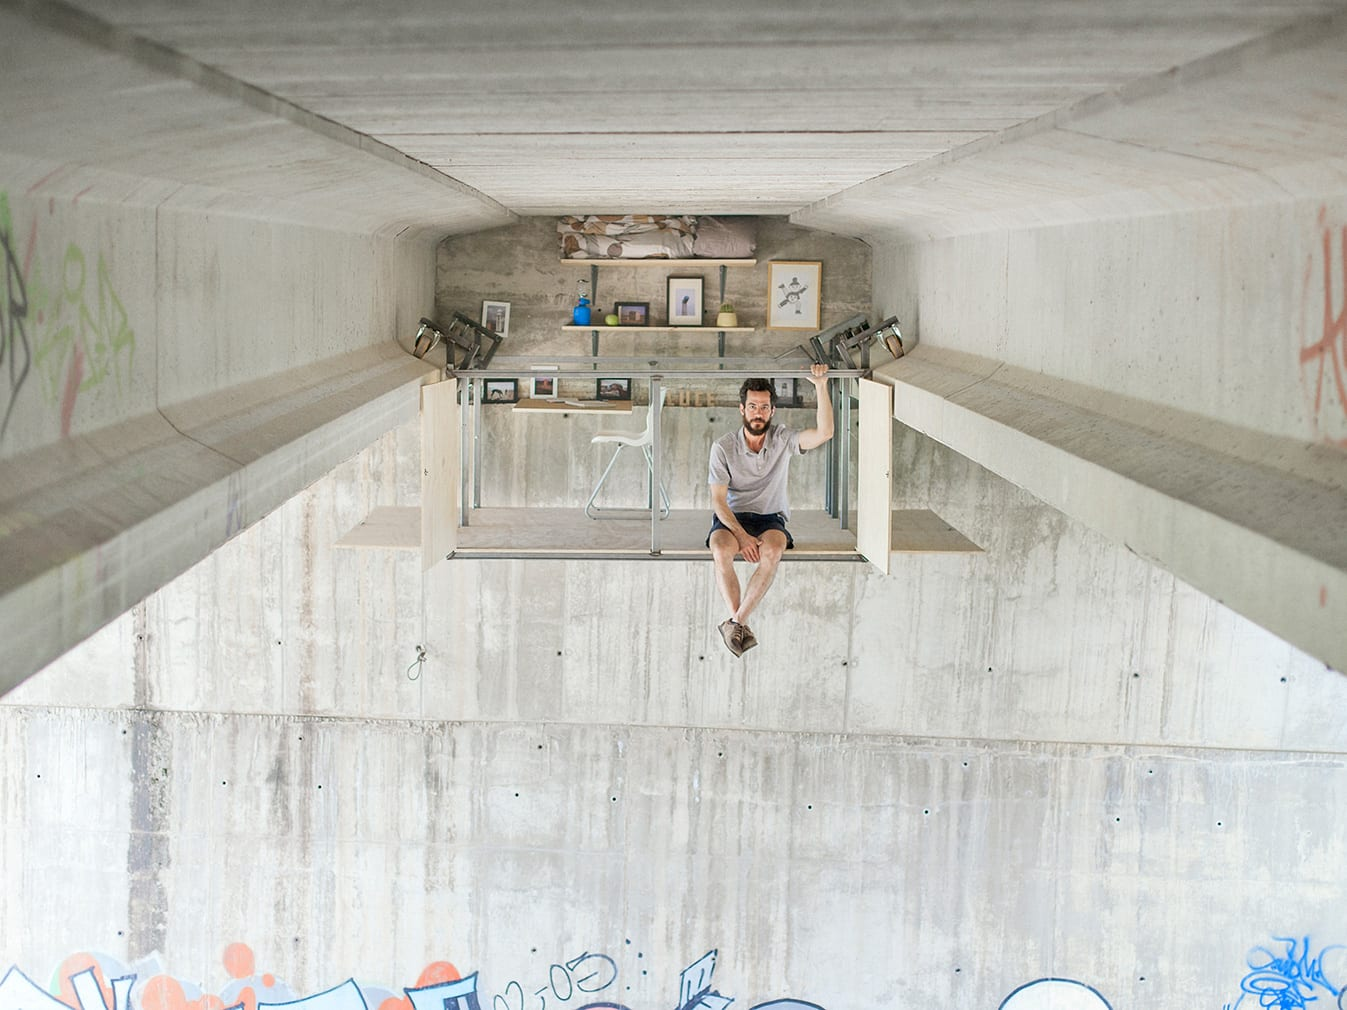 Fernando Abellanas Designs Secret Studio Under Bridge in Spain | Yellowtrace